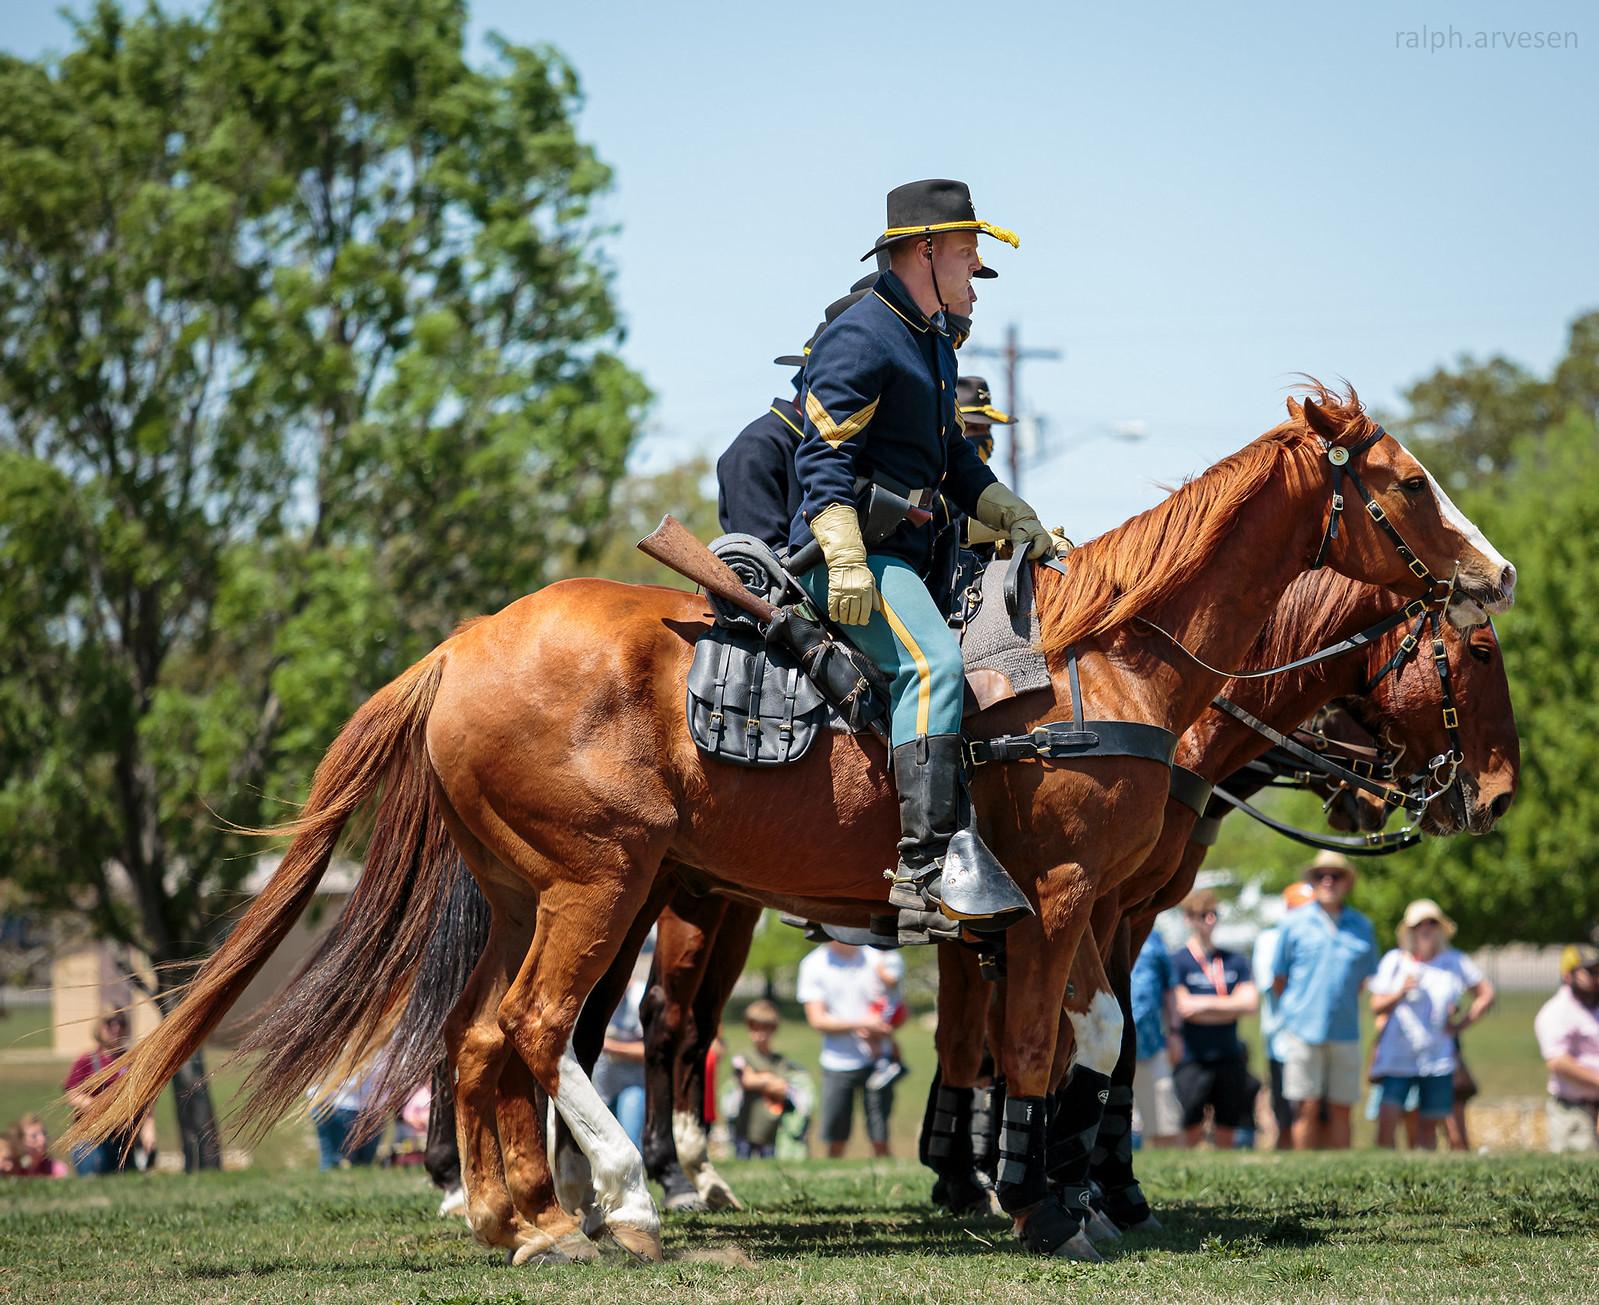 1st Cavalry Division Horse Cavalry Detachment | Texas Review | Ralph Arvesen